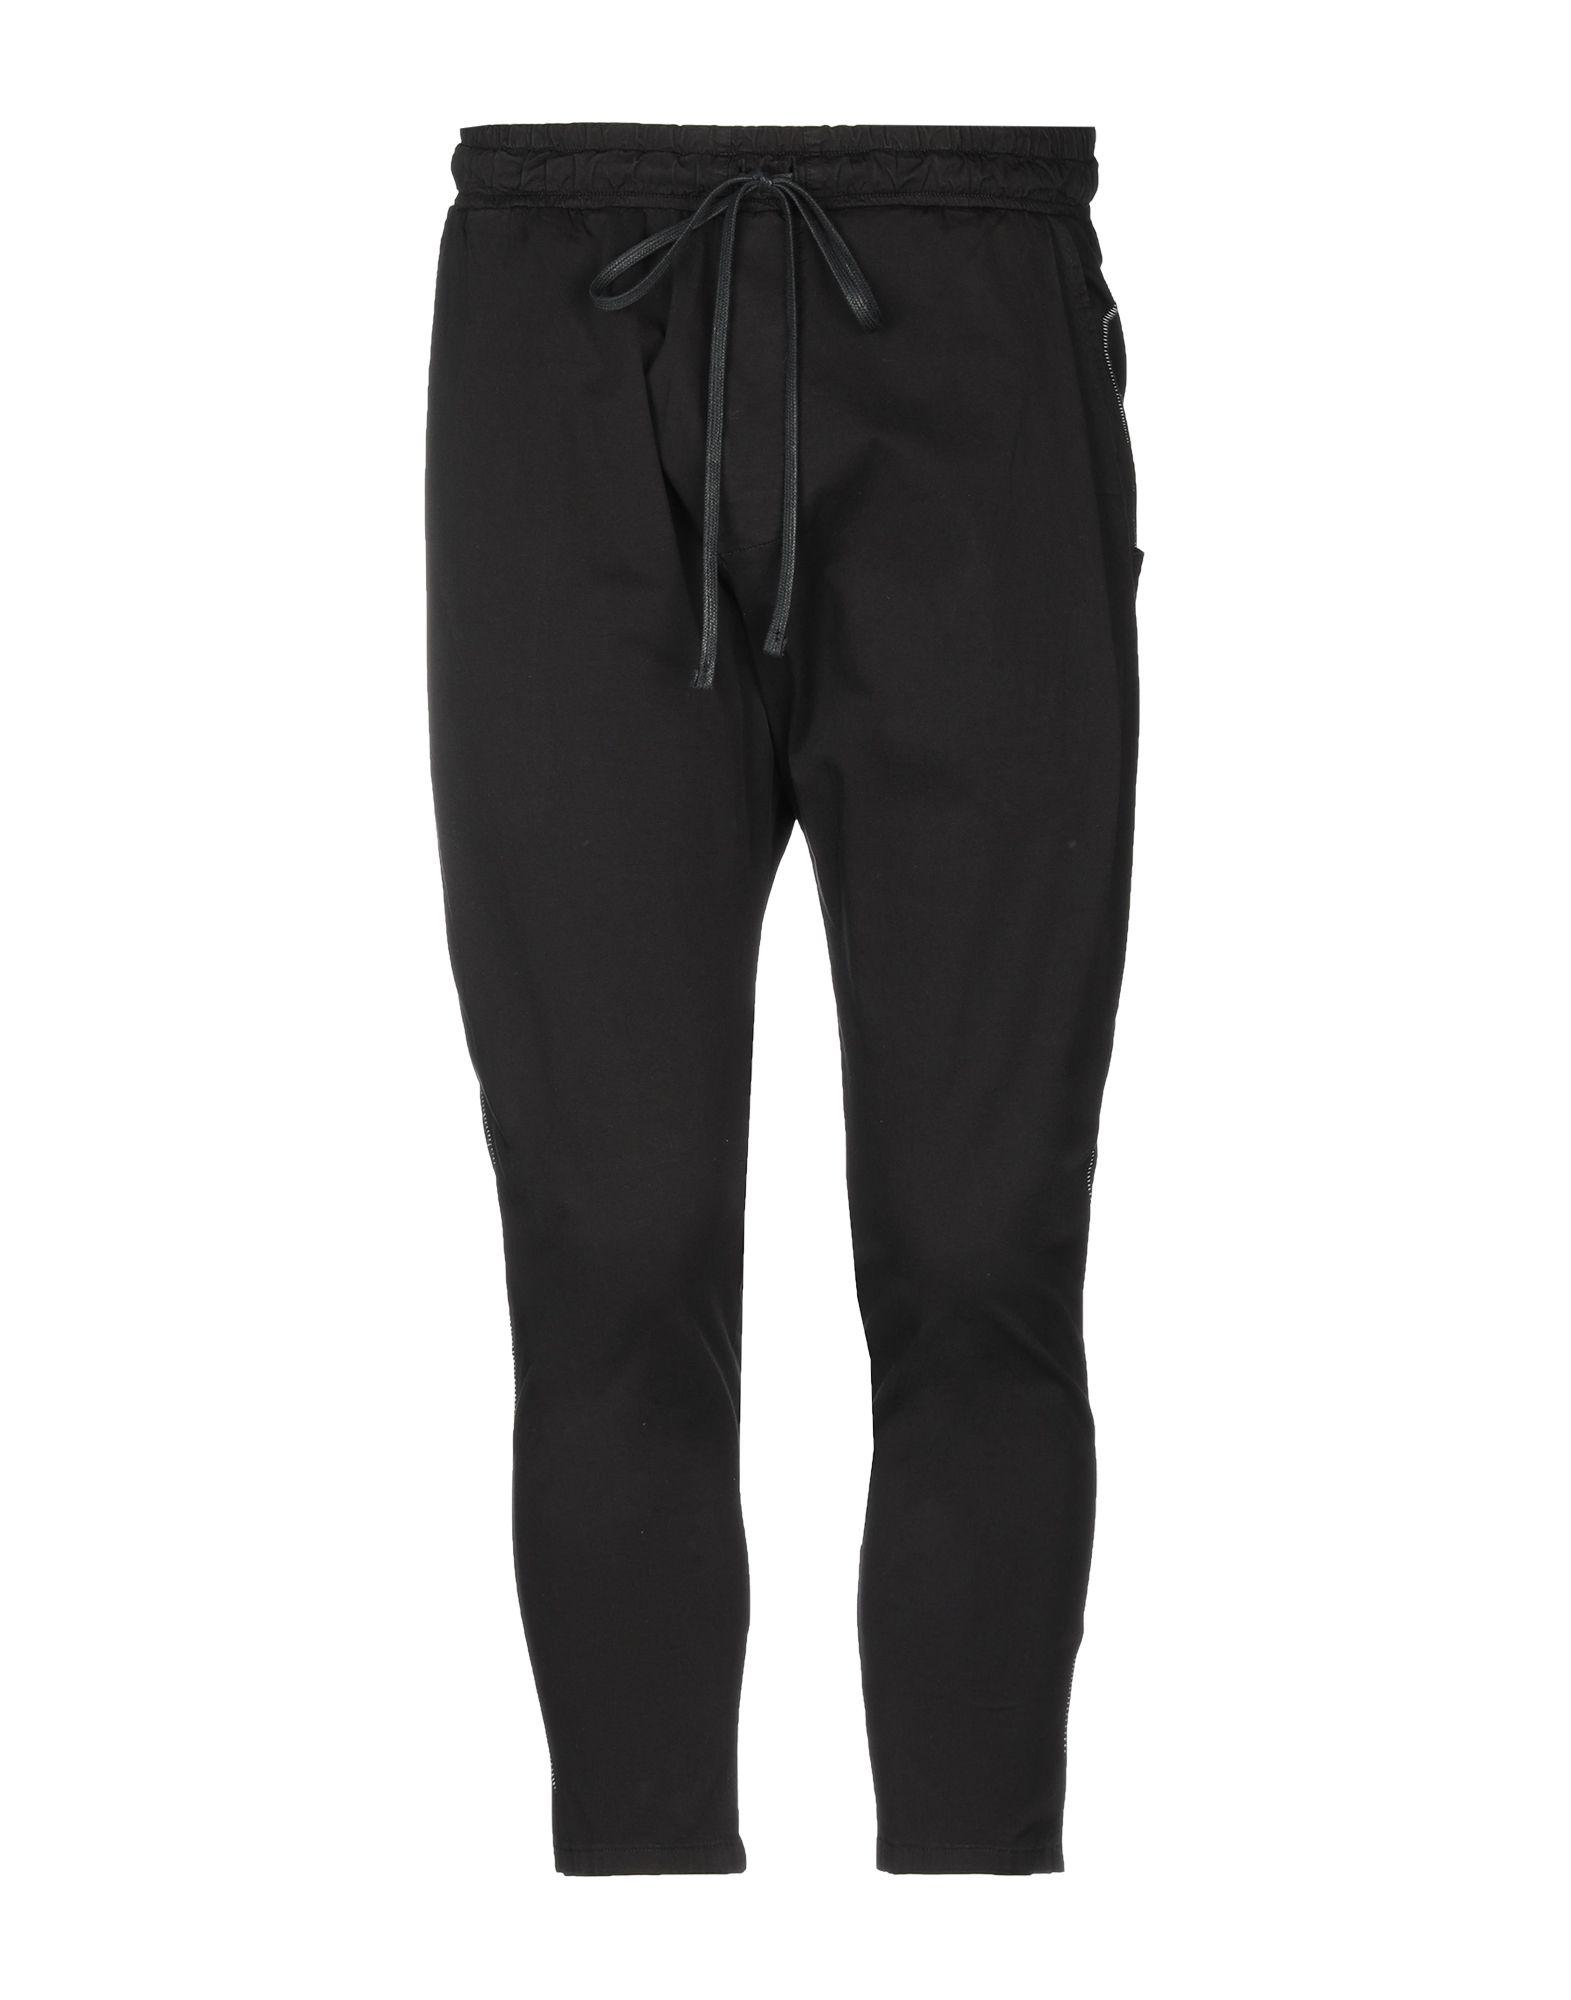 DARK LABEL Повседневные брюки dark label pубашка